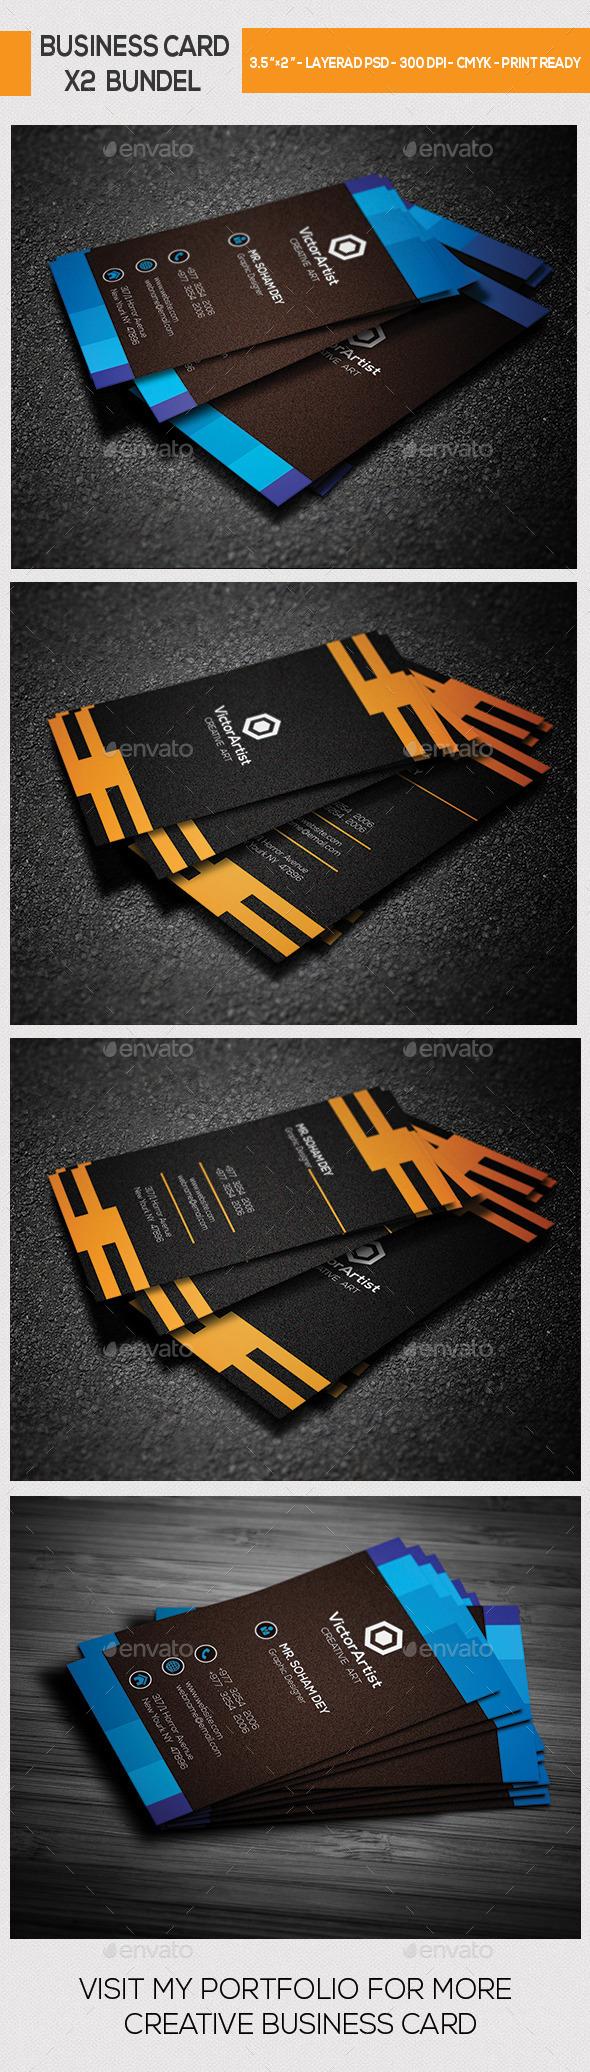 X2 Creative Business Card Bundle - Corporate Business Cards